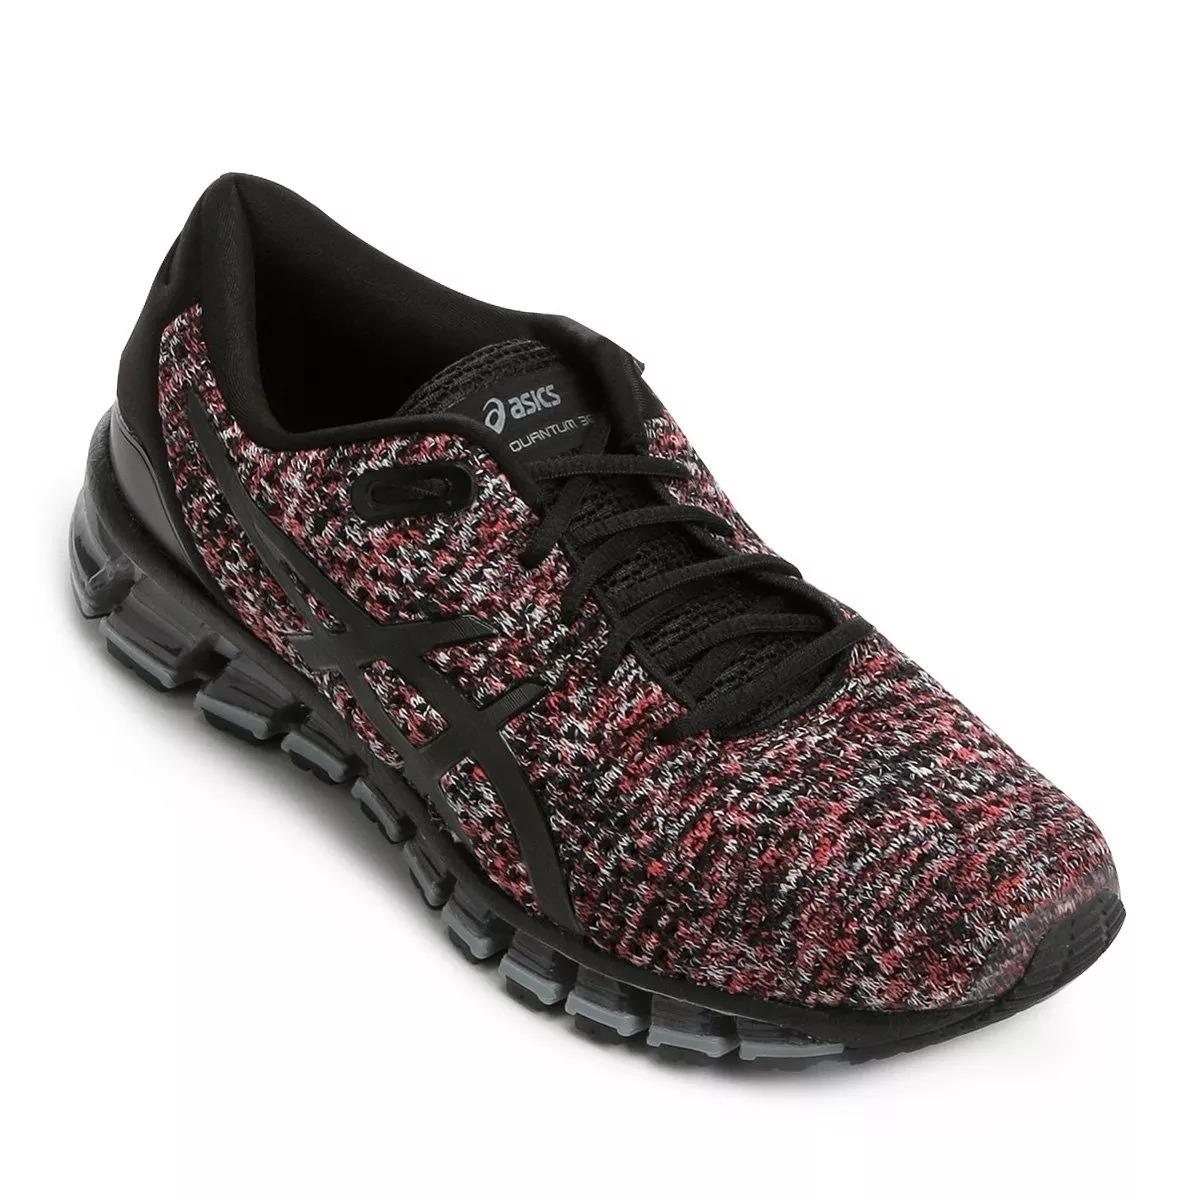 tênis asics gel-quantum 360 knit 2 masculino - preto e cinza. Carregando  zoom. 1c4792c8be5ed